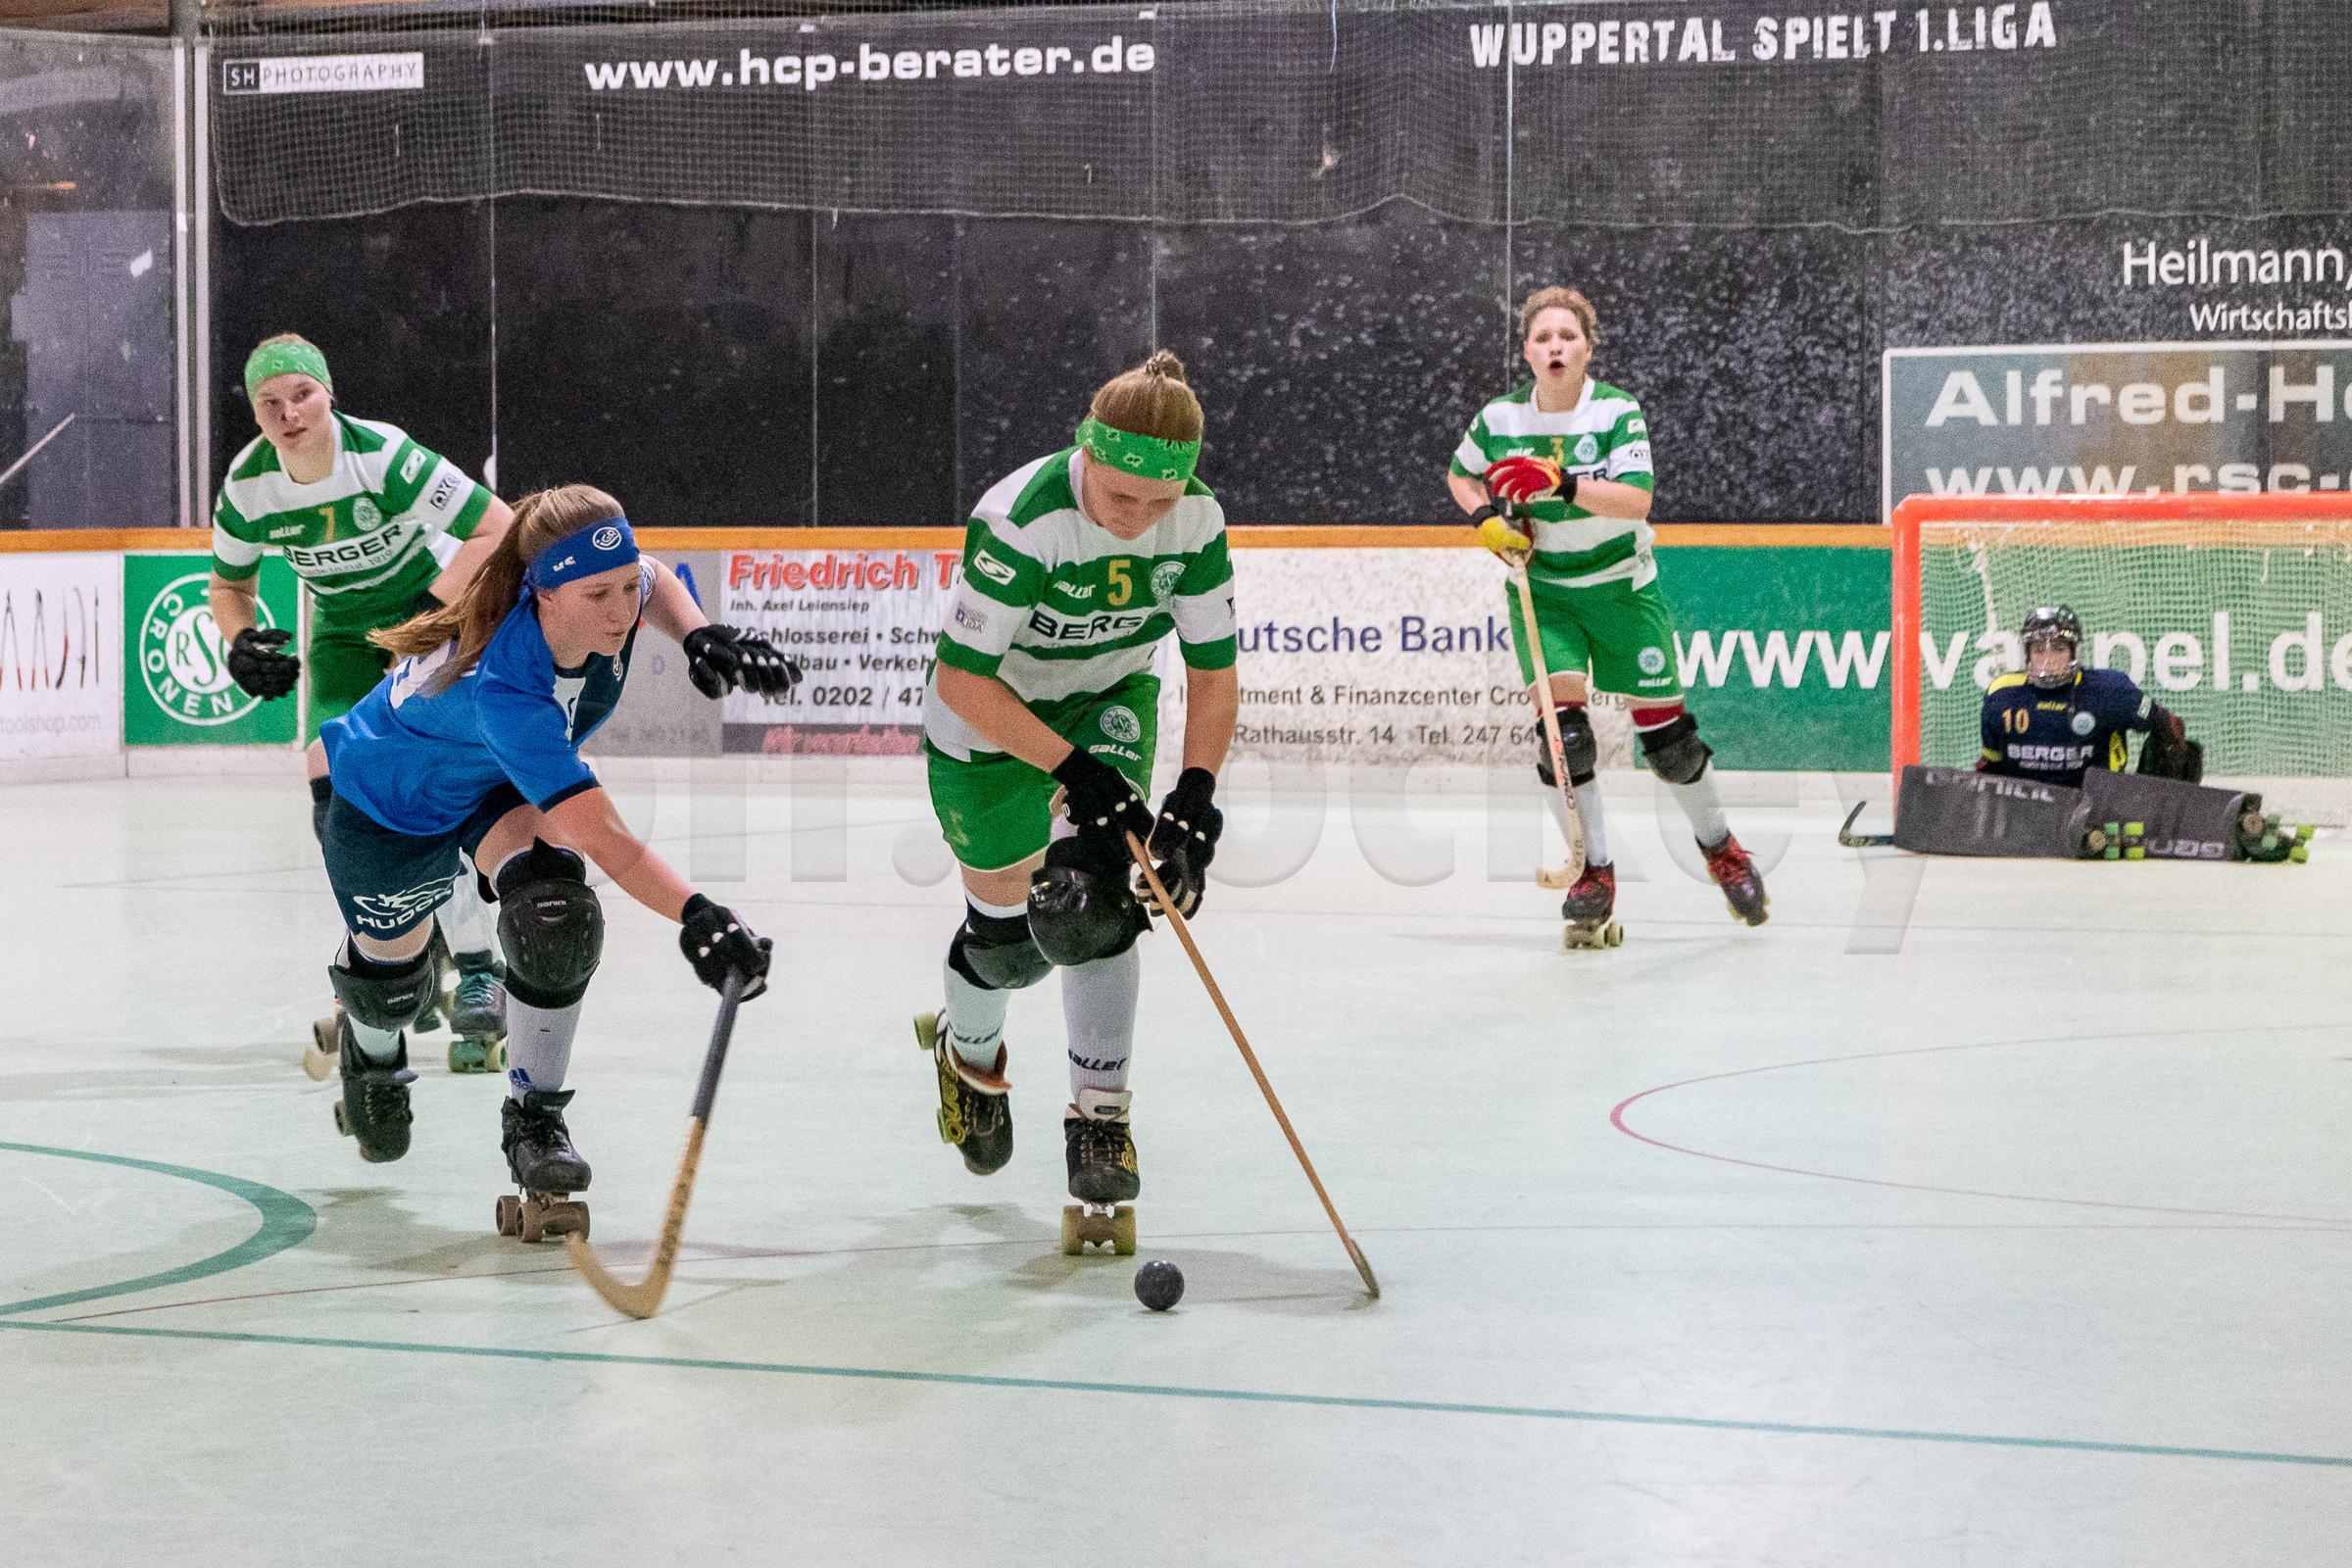 RSC Cronenberg Rollhockey Bundesliga Damen Spieltag 29.03.2019